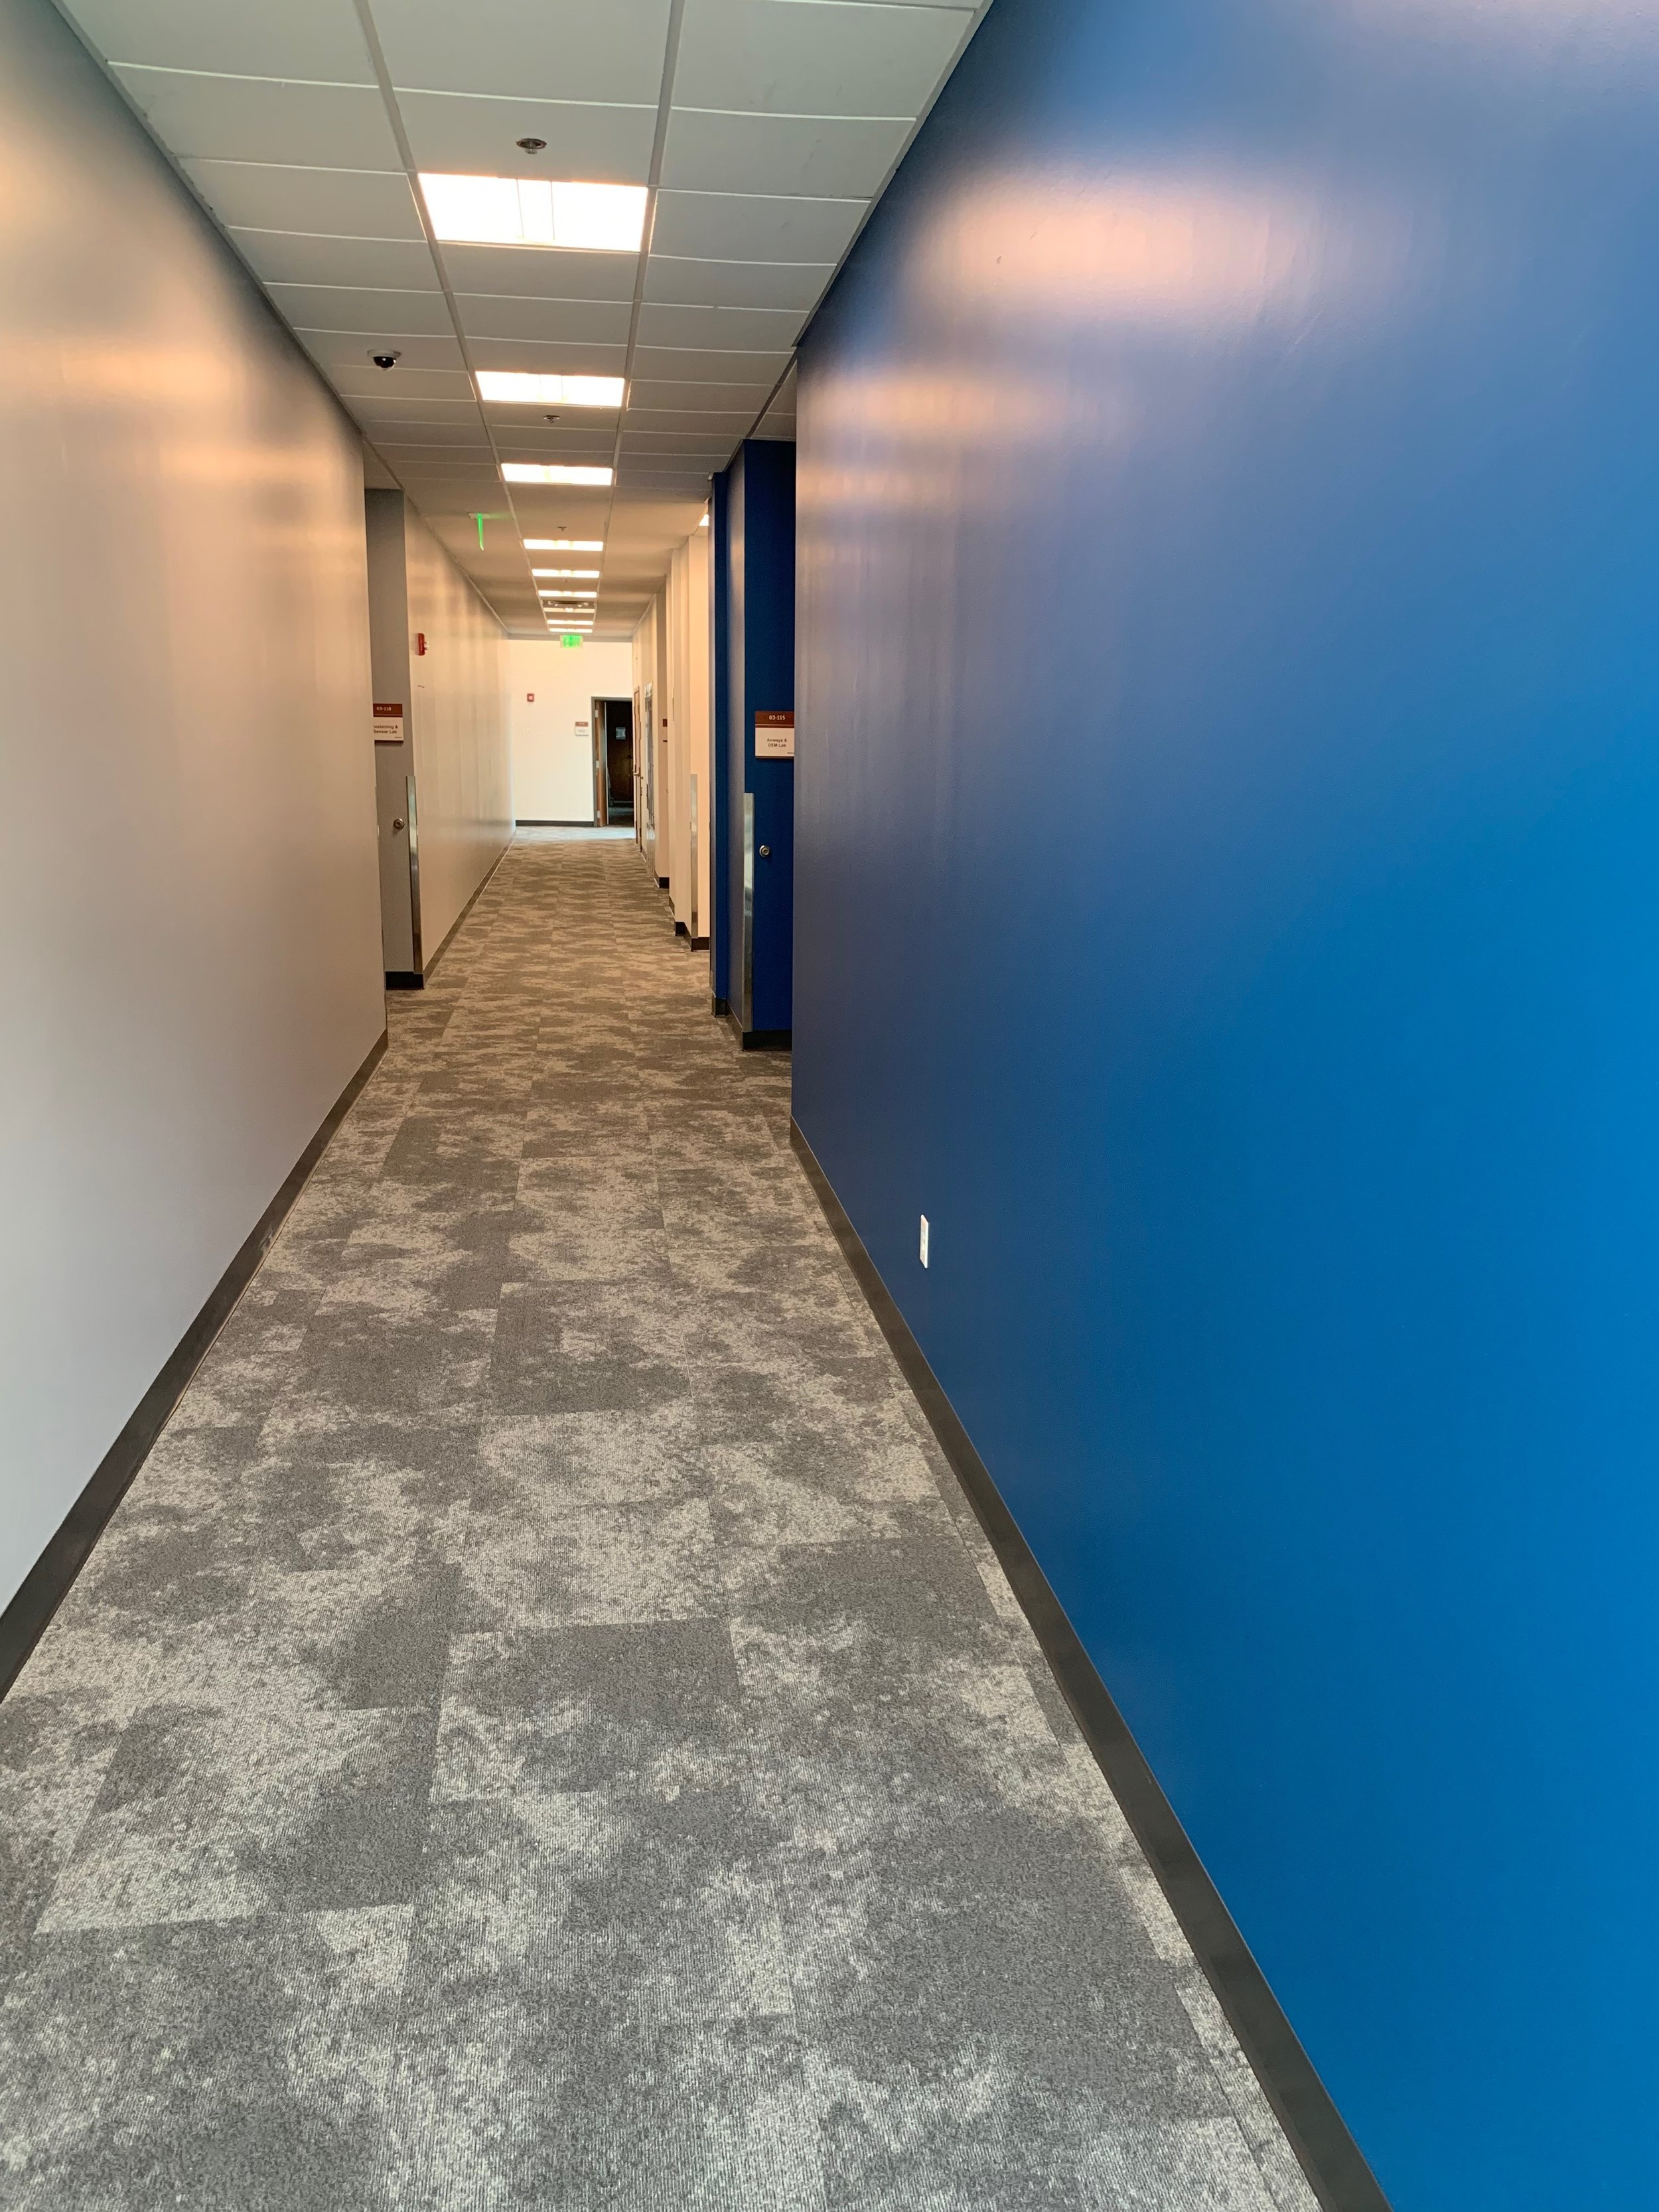 Medtronic building three hallway final 4-27-19.JPG